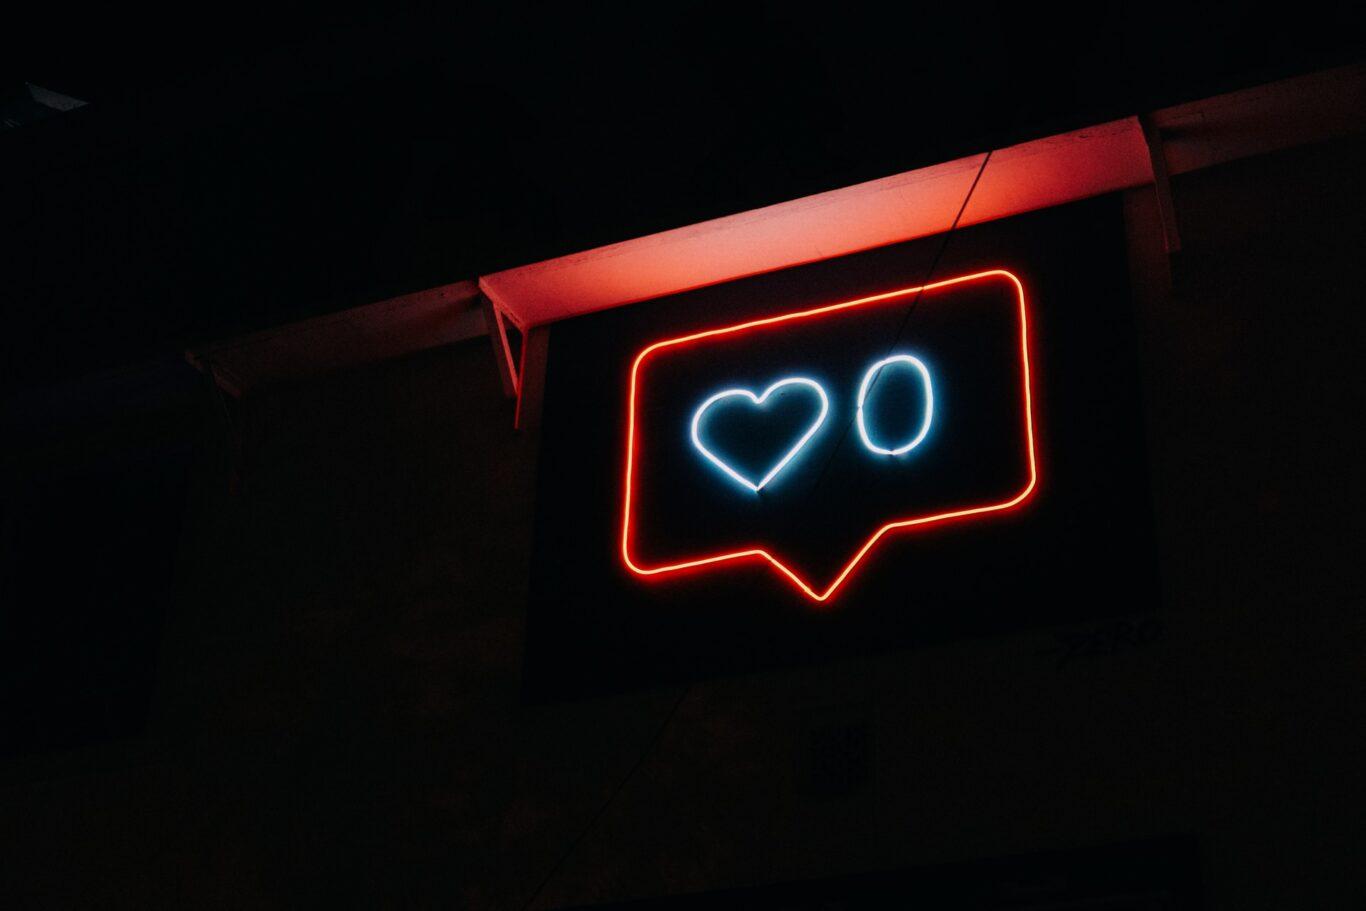 social media γάμος-Μια νέα ειδικότητα επαγγελματία για τον γάμο